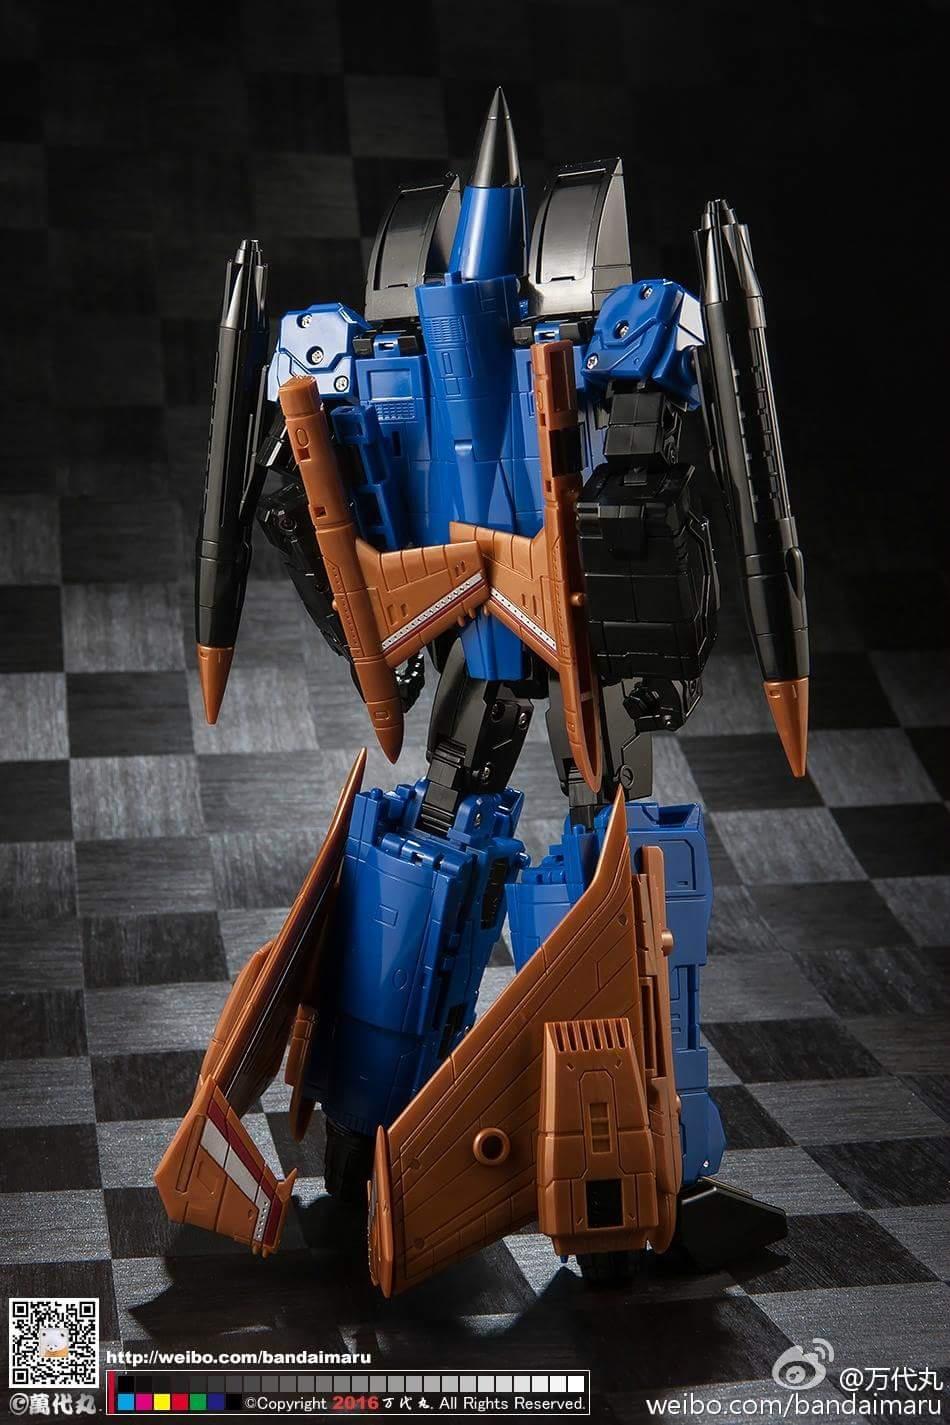 [ToyWorld] Produit Tiers - TW-M02A Combustor (Ramjet/Statoréacto), TW-M02B Assault (Thrust/Fatalo), TW-M02C Requiem (Dirge/Funébro) - Page 3 LAQxgA8g